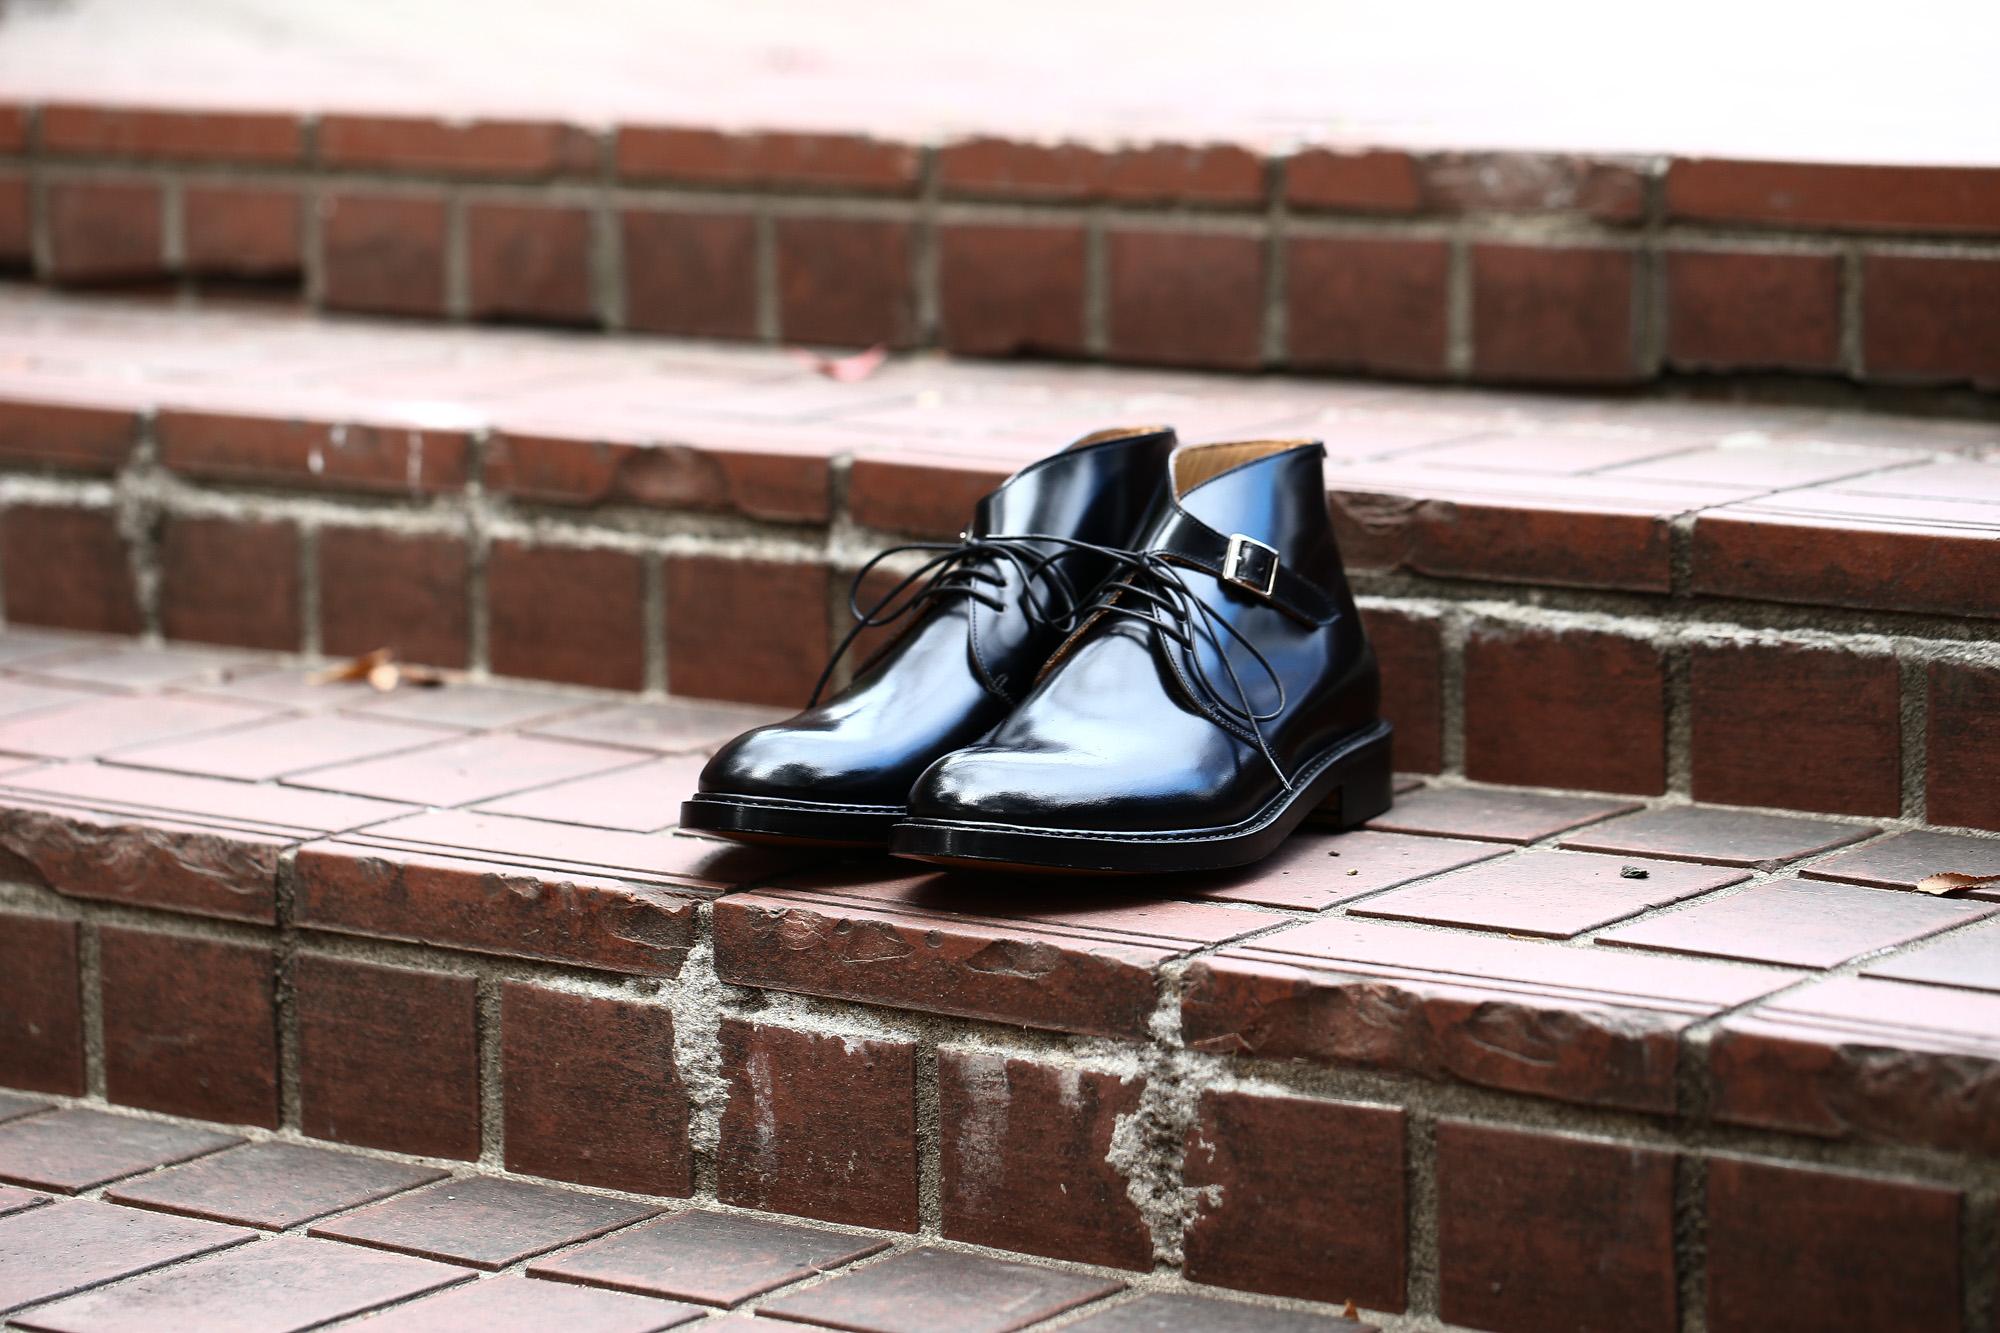 Cuervo (クエルボ) 【Derringer Cordovan / デリンジャー コードバン】 Shell Cordovan シェルコードバンレザー Goodyear Welt Process  Double Leather Sole Chukka Boots チャッカブーツ  BLACK(ブラック・BLK) MADE IN JAPAN(日本製) 2017 秋冬新作 愛知 名古屋 ZODIAC ゾディアック クエルボ チャッカブーツ コードバン 5(24),5.5(24.5),6(25),6.5(25.5),7(26),7.5(26.5),8(27),8.5(27.5),9(28)